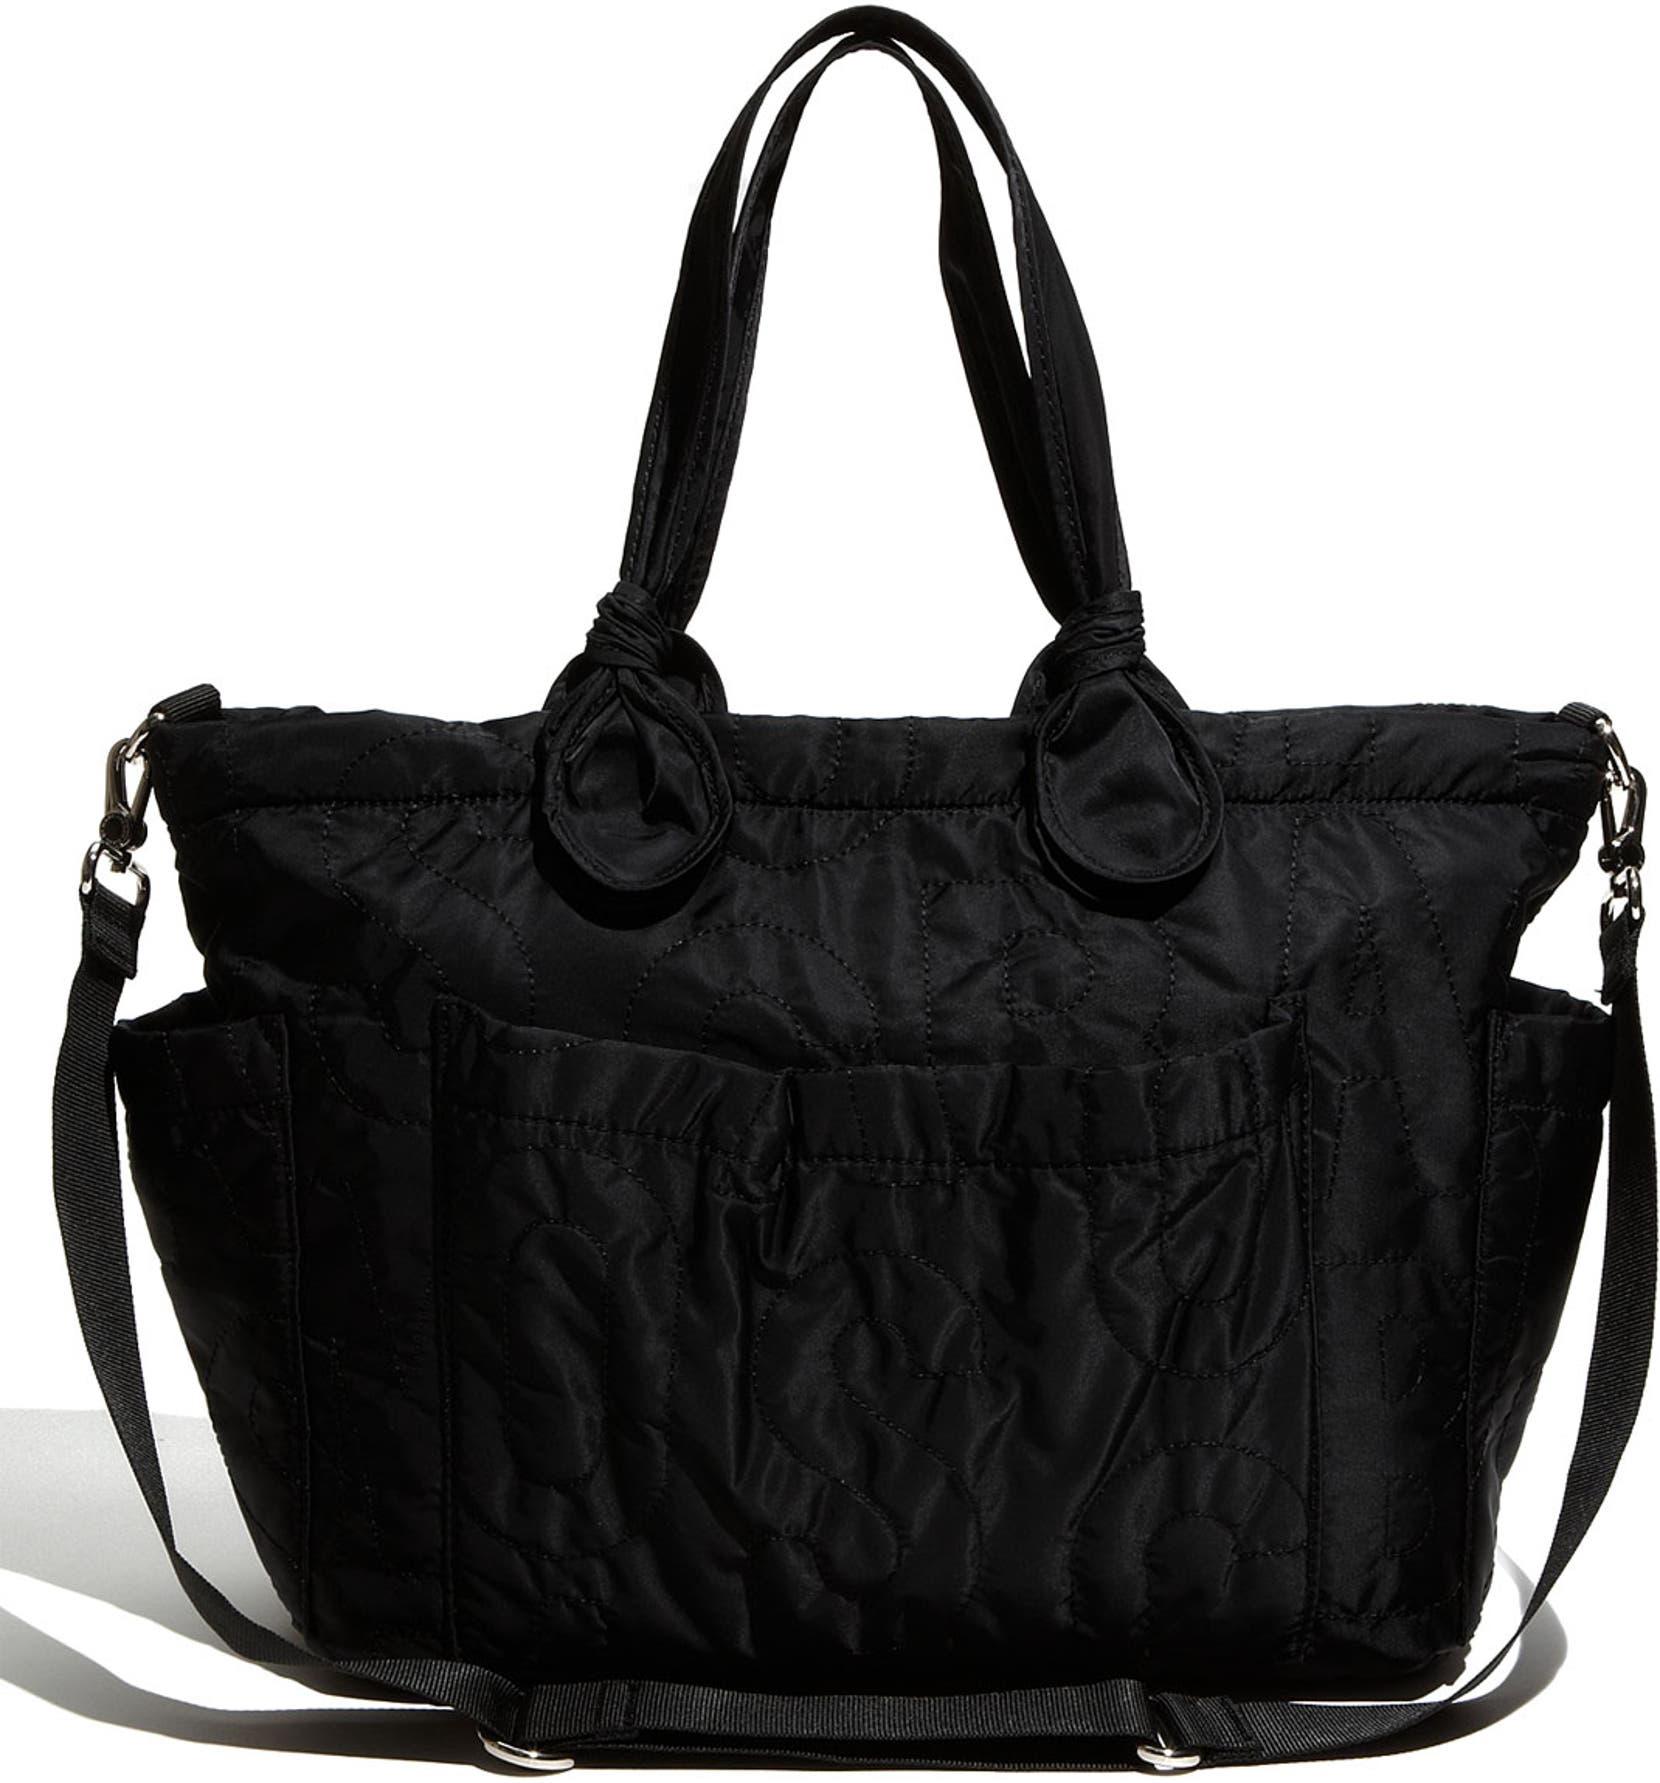 b5e78e32a011 MARC BY MARC JACOBS  Pretty Nylon Eliz-A-Baby  Diaper Bag